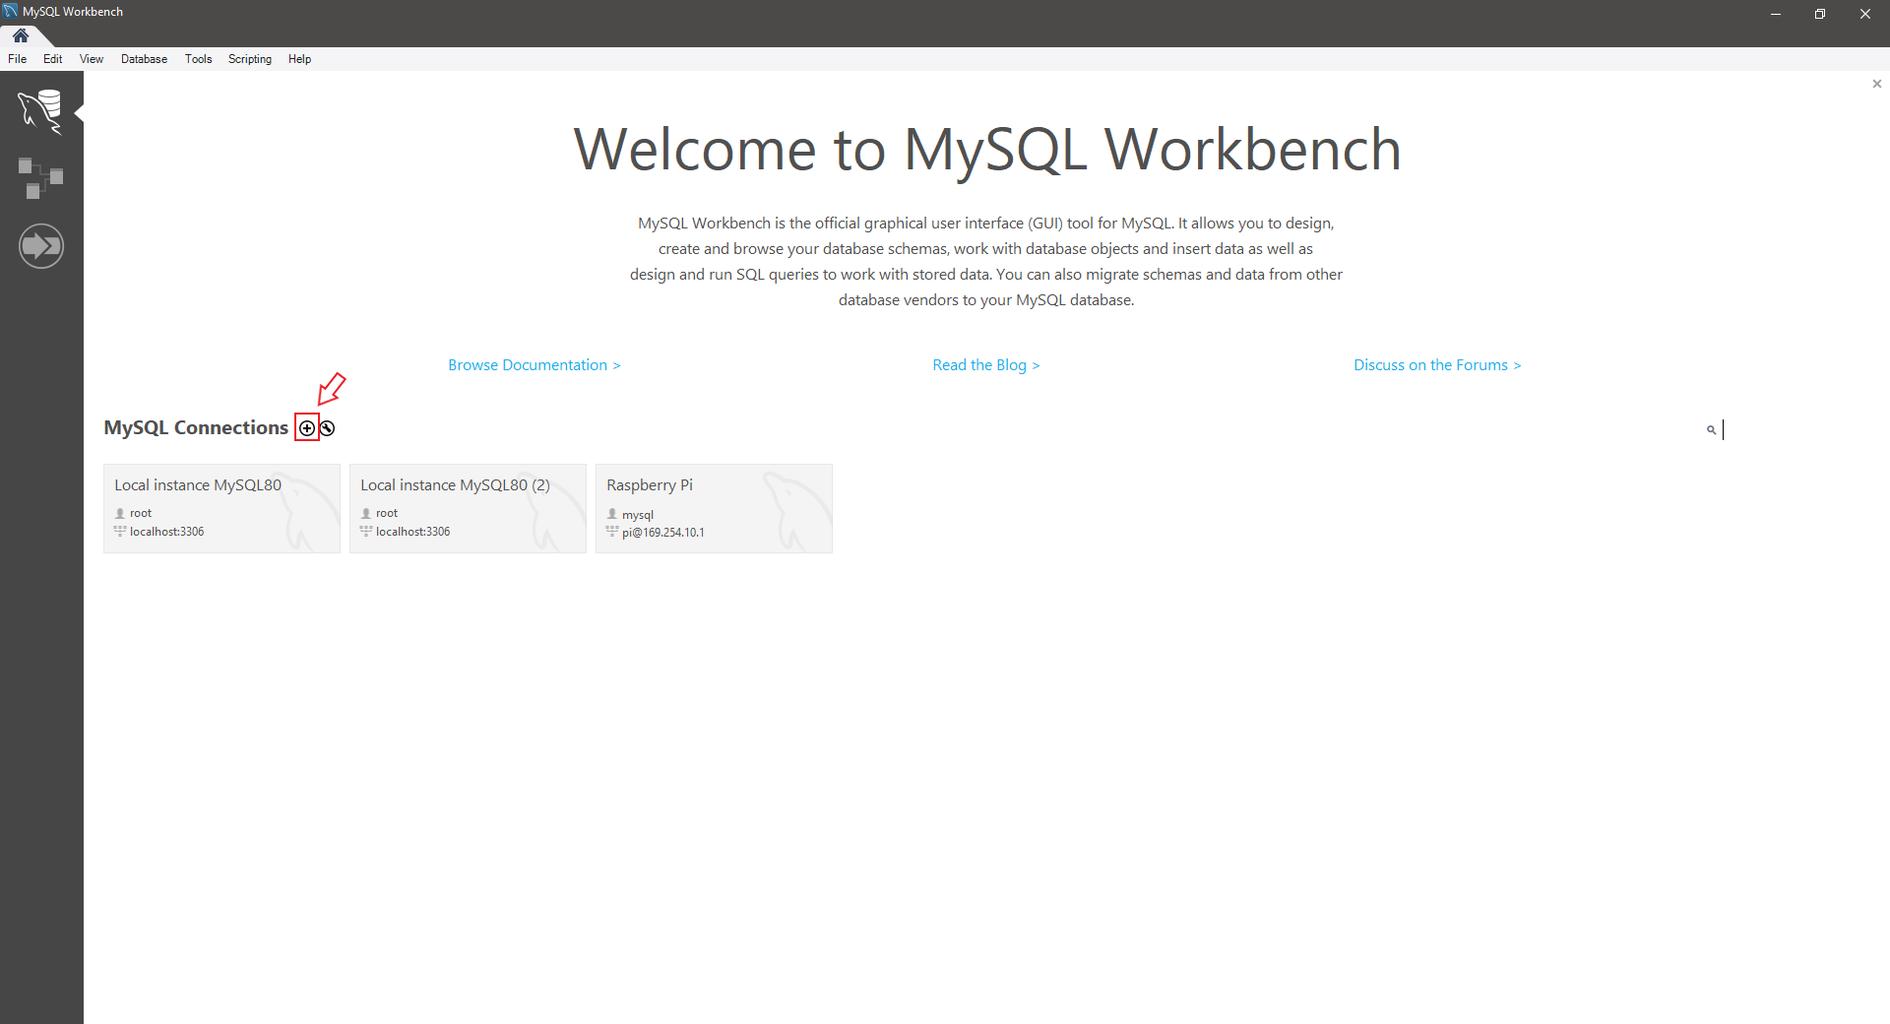 Step 3: Connecting to the MySQL Database, Creating Database